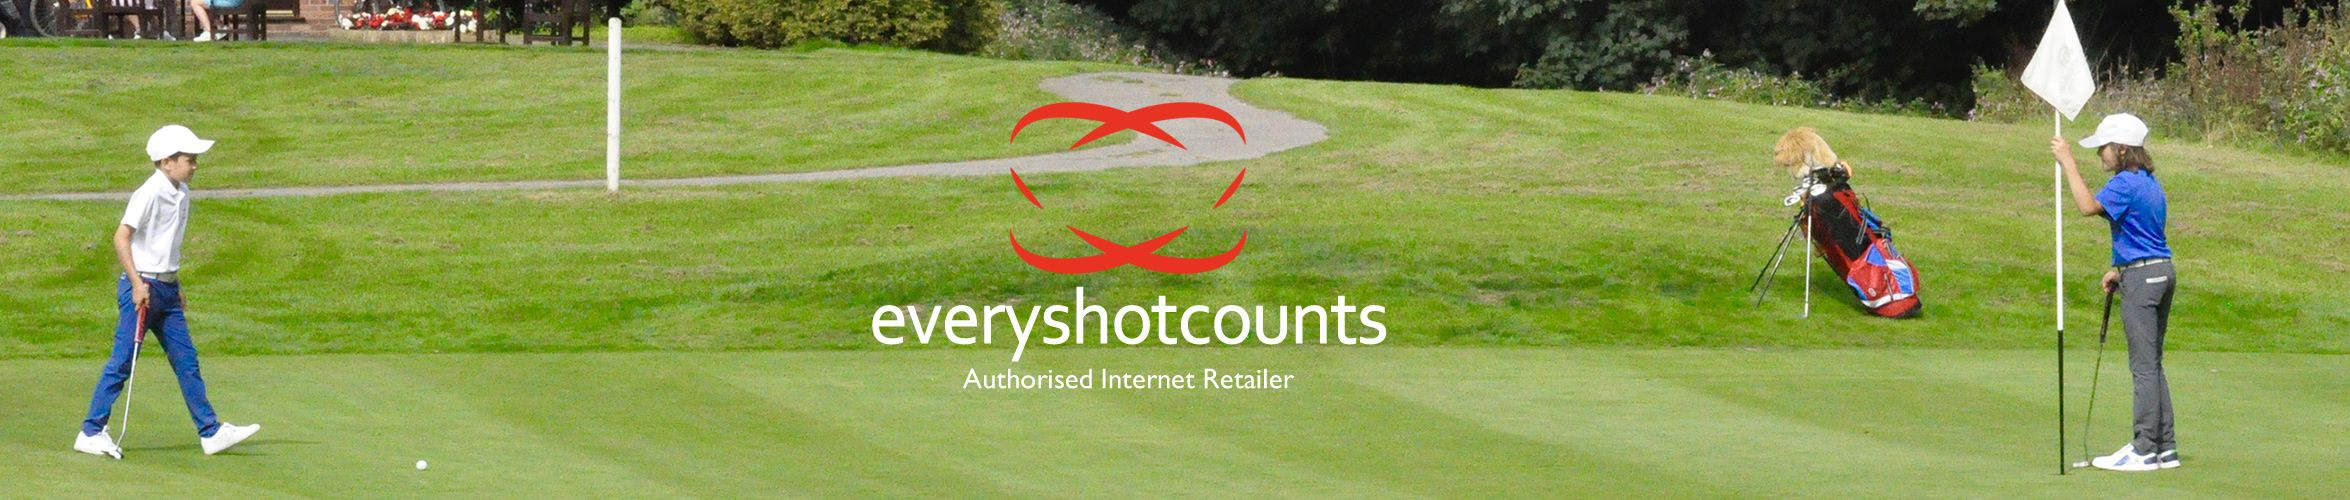 everyshotcounts Golf